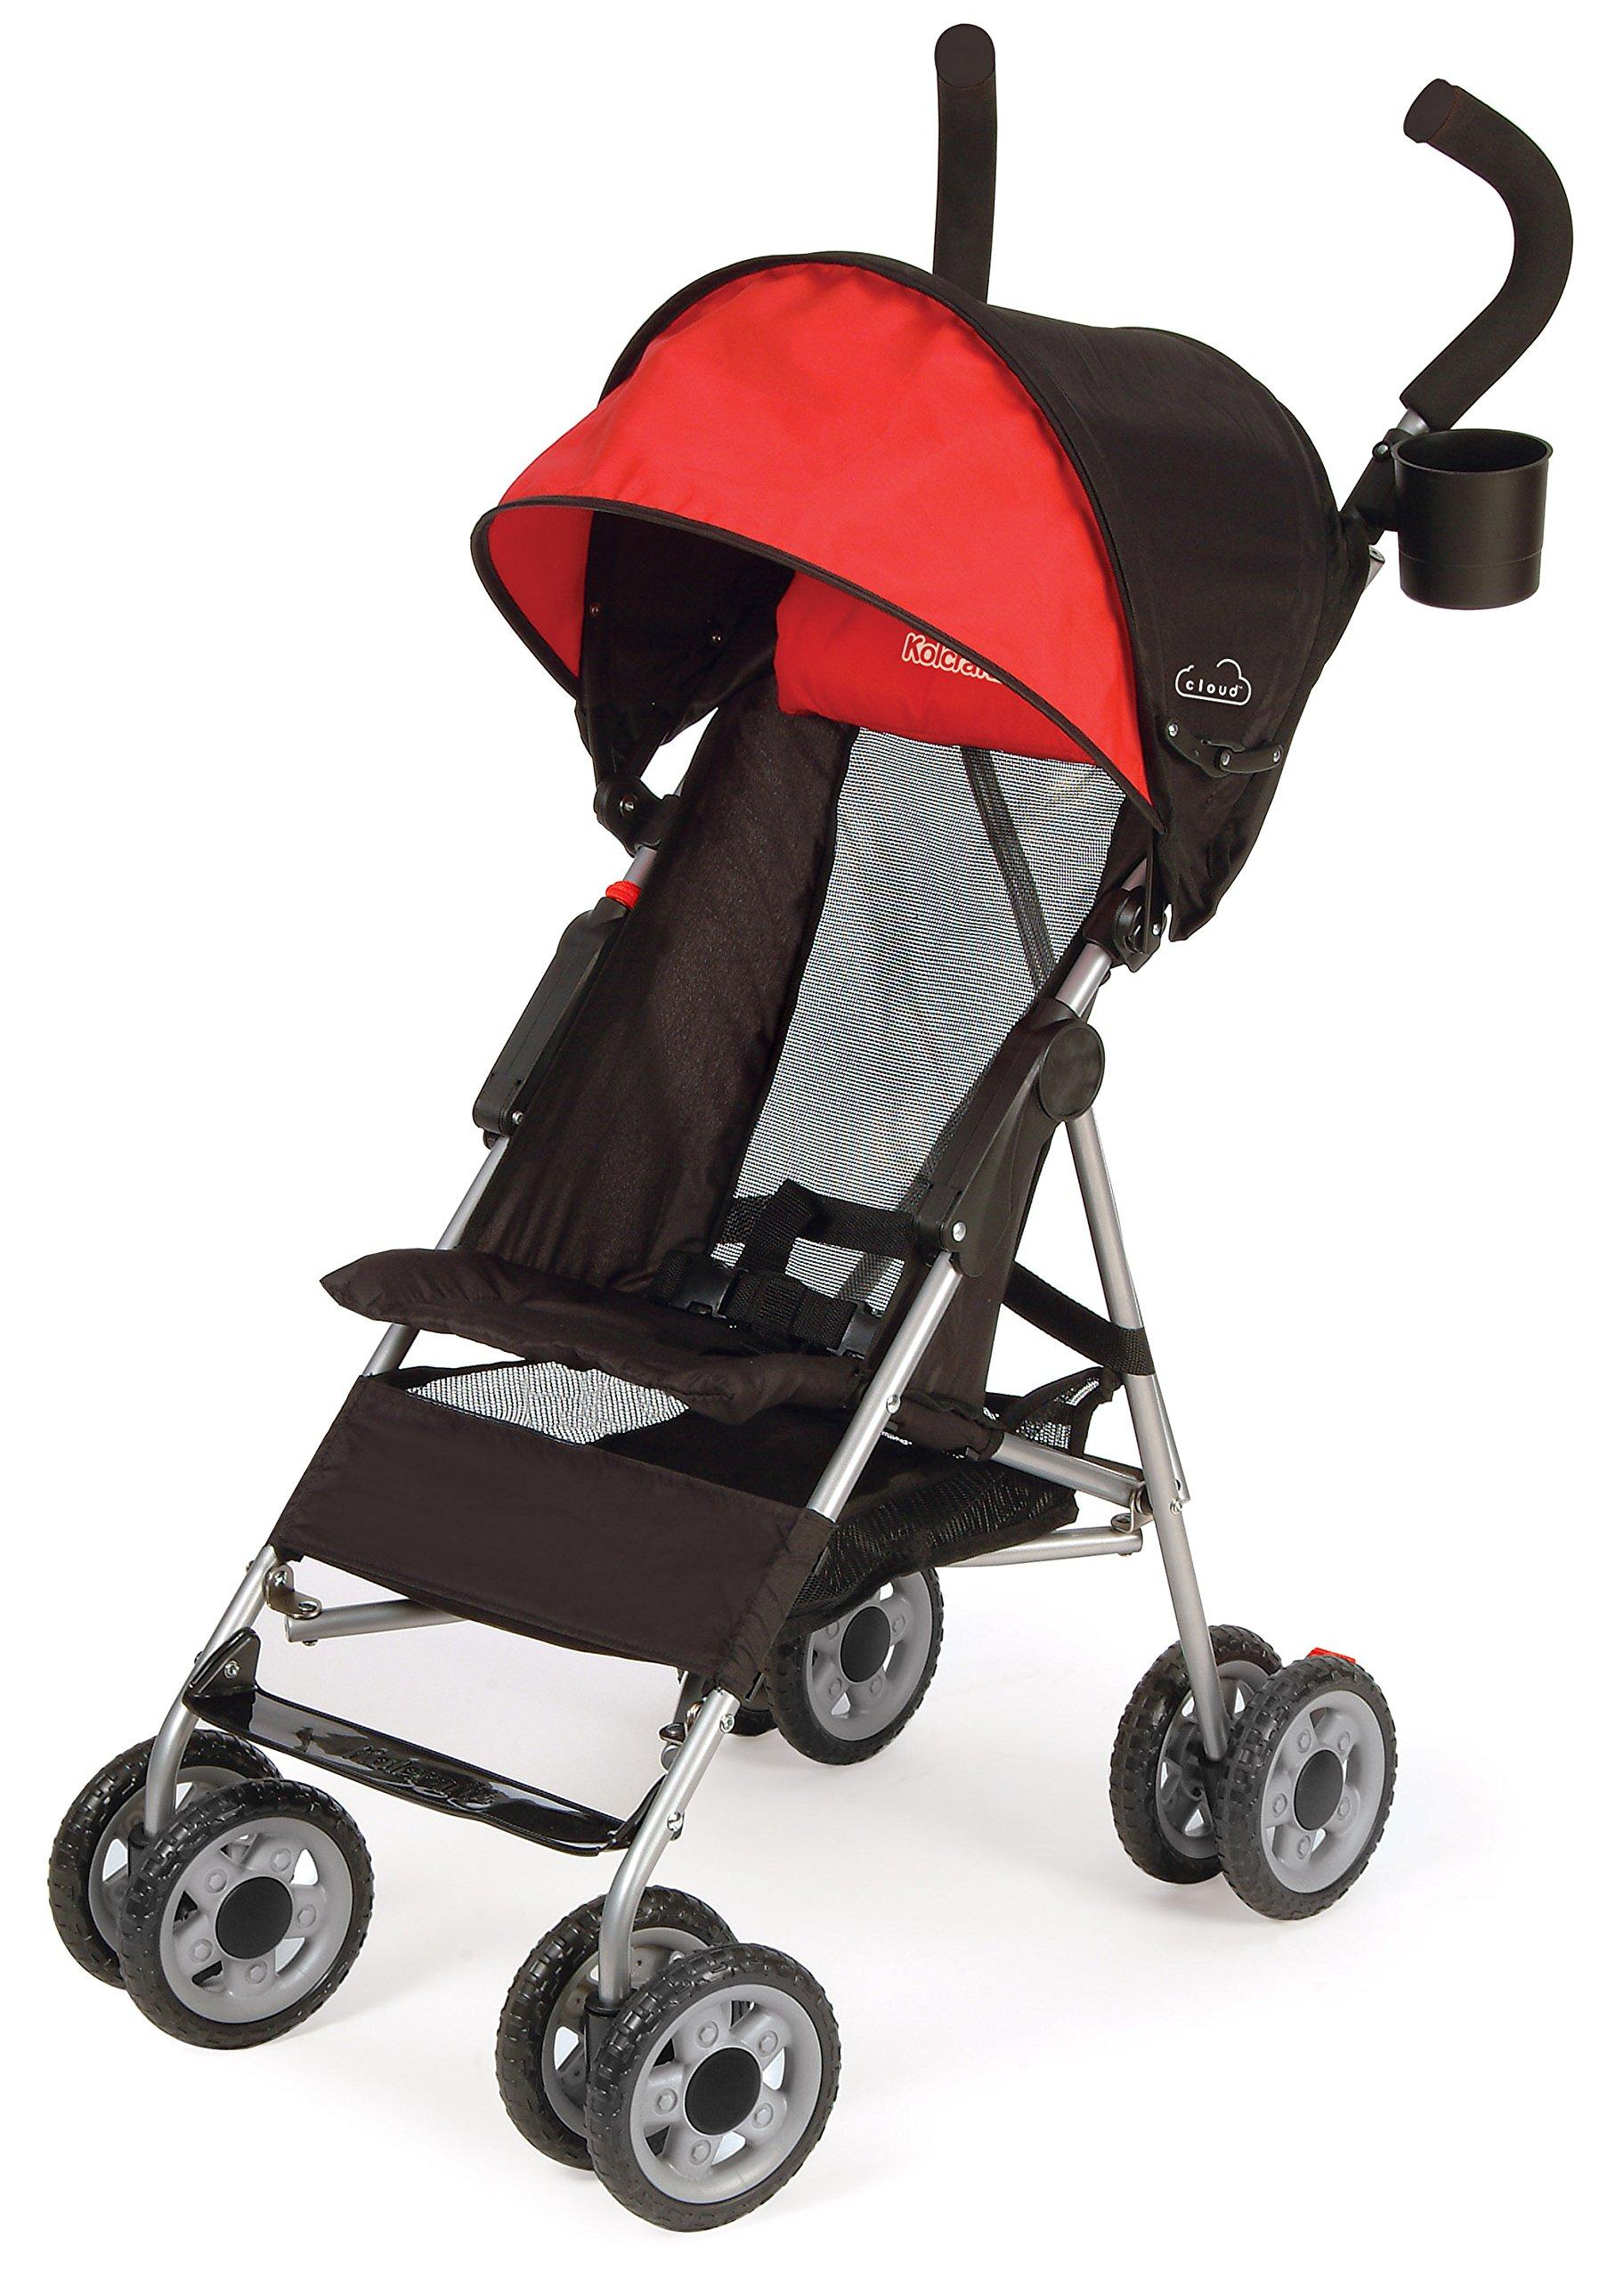 Kolcraft Cloud Lightweight Umbrella Stroller with Large Sun Canopy, Scarlet Red